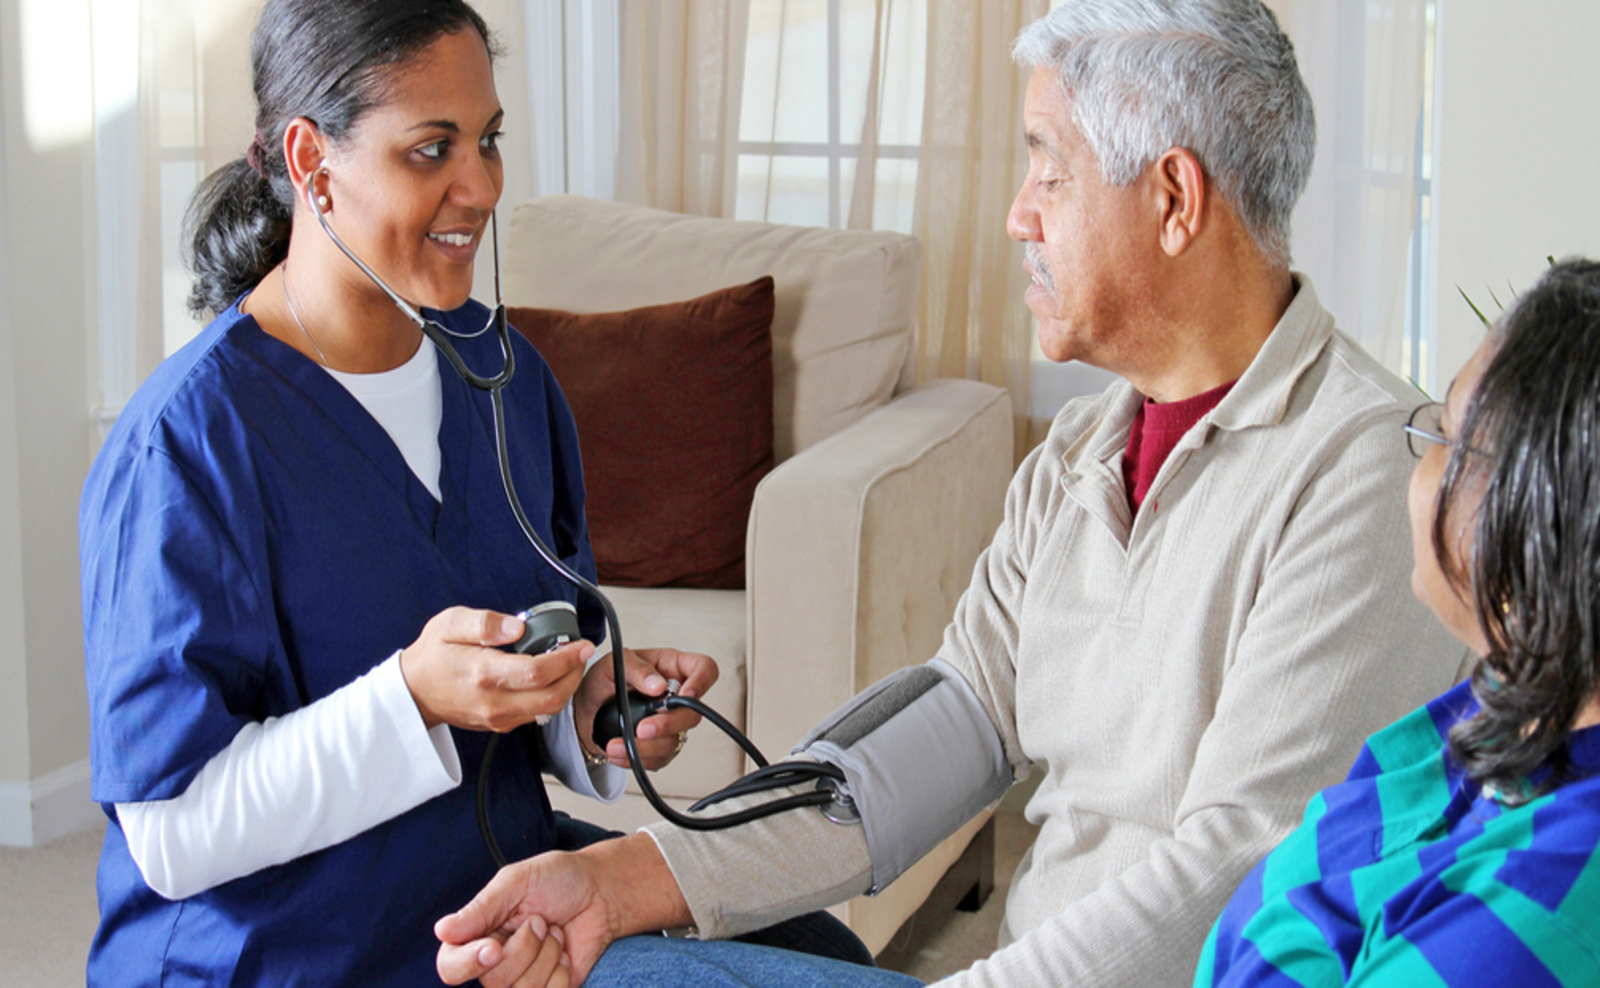 HOME HEALTH CARE SERVICE PROVIDERS